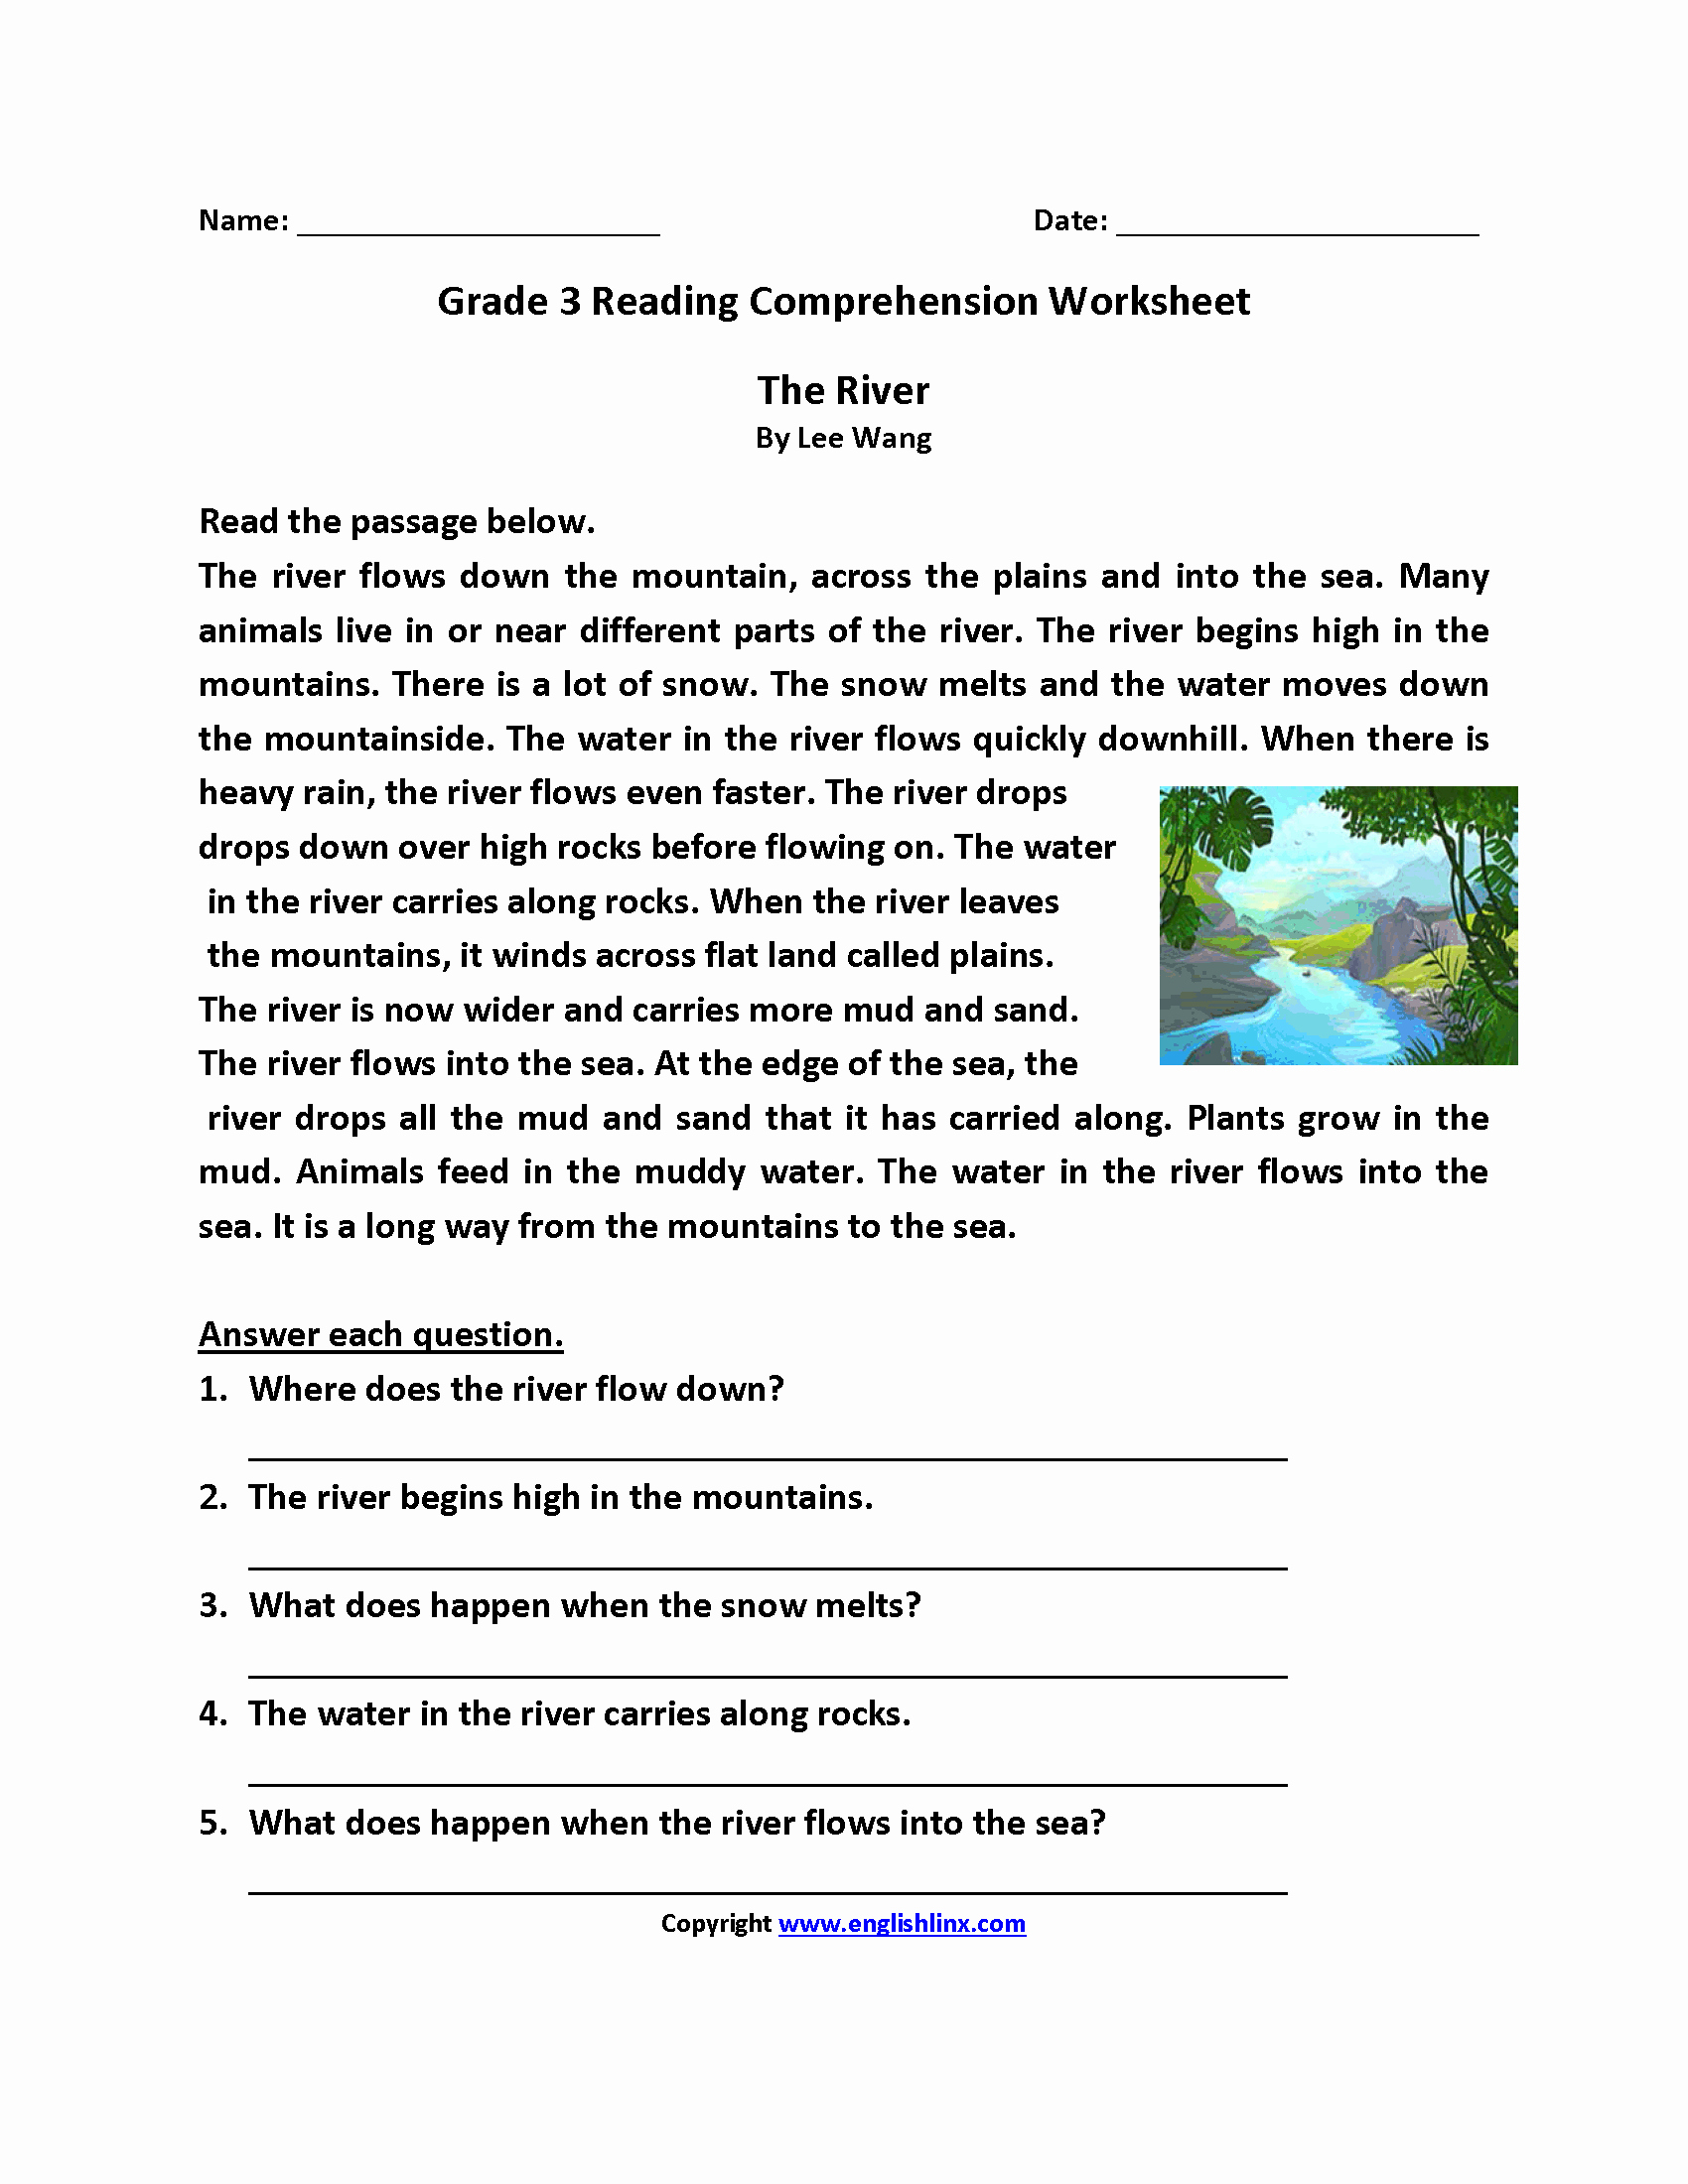 Proofreading Worksheets 3rd Grade Beautiful Prehension for Class 3 Worksheet thekidsworksheet